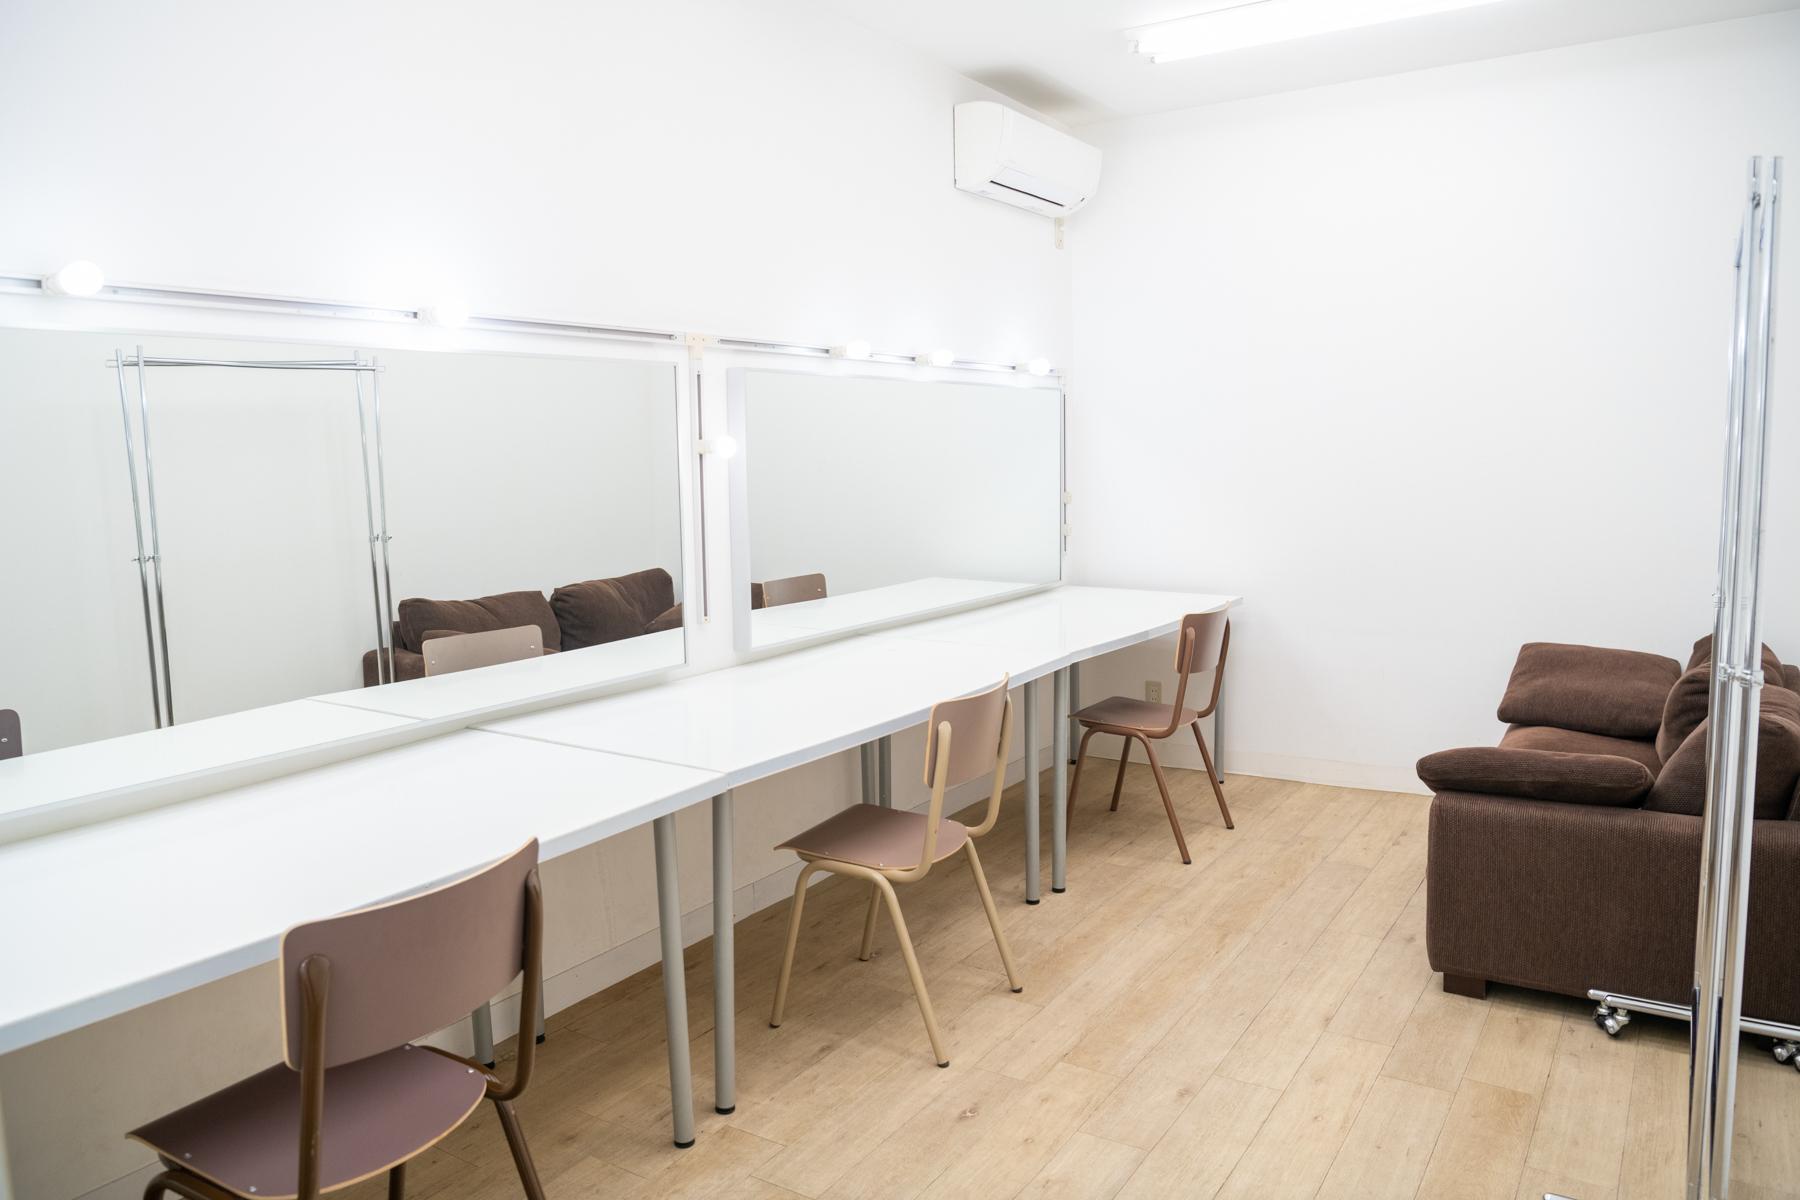 studio Licorne 野毛 (スタジオリコルネ)2st対面キッチン